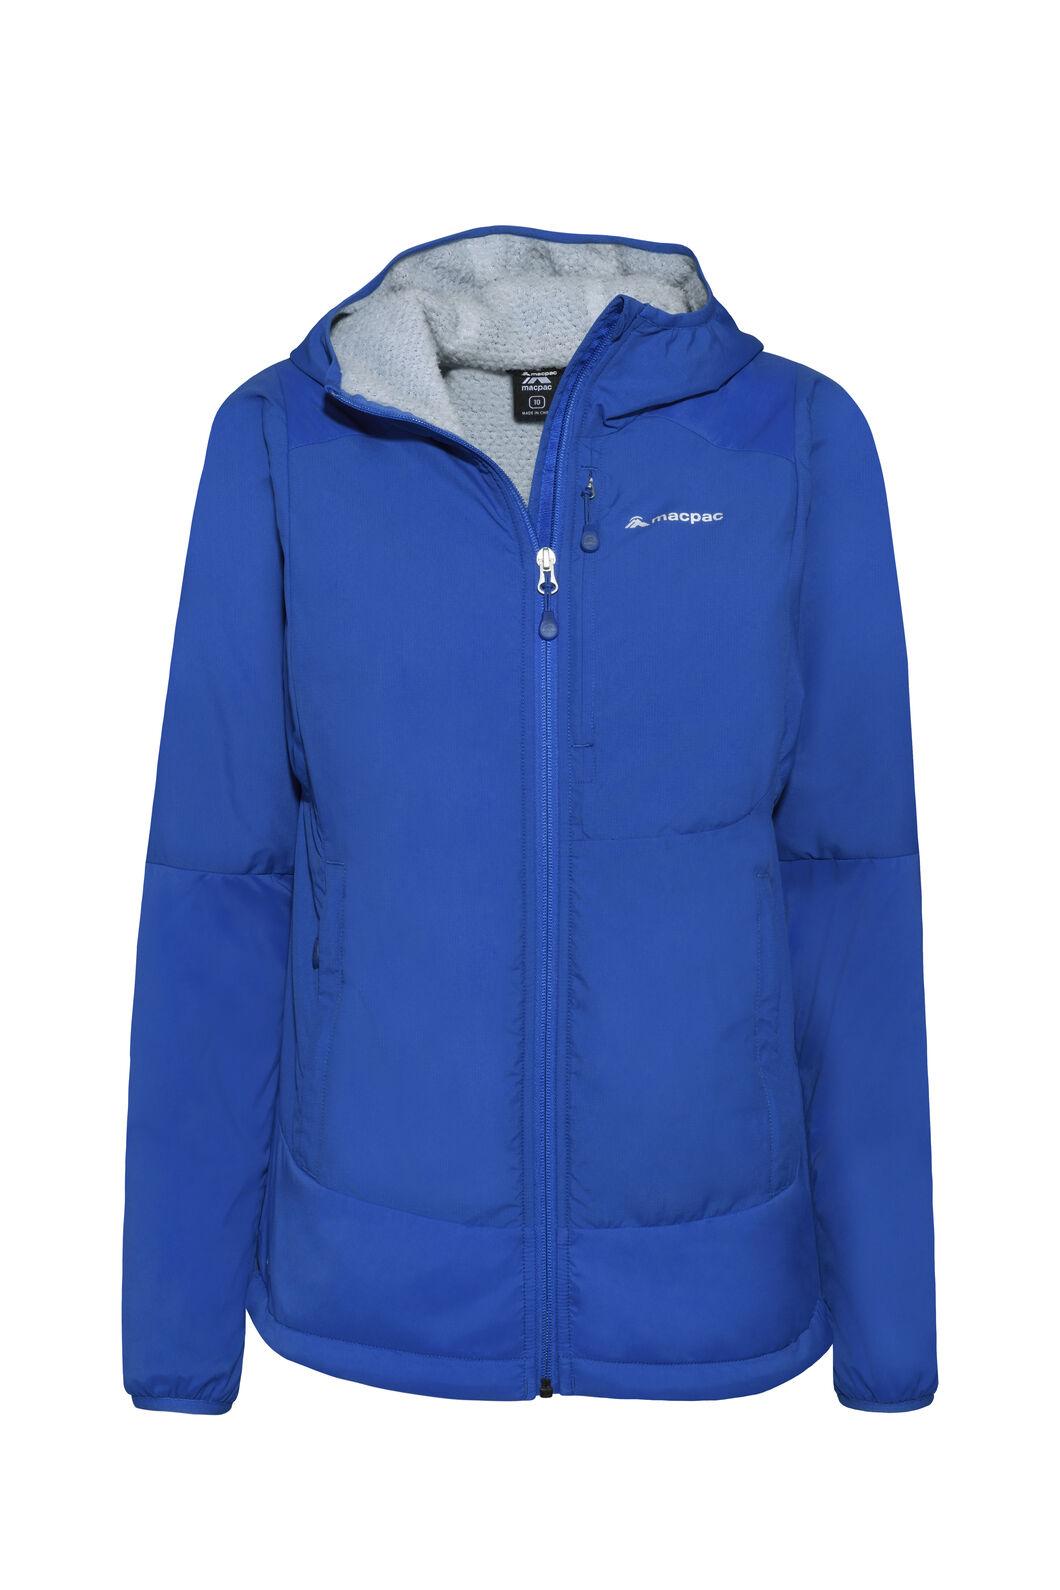 Macpac Pisa Polartec® Hooded Jacket — Women's, Nautical Blue/Pearl, hi-res